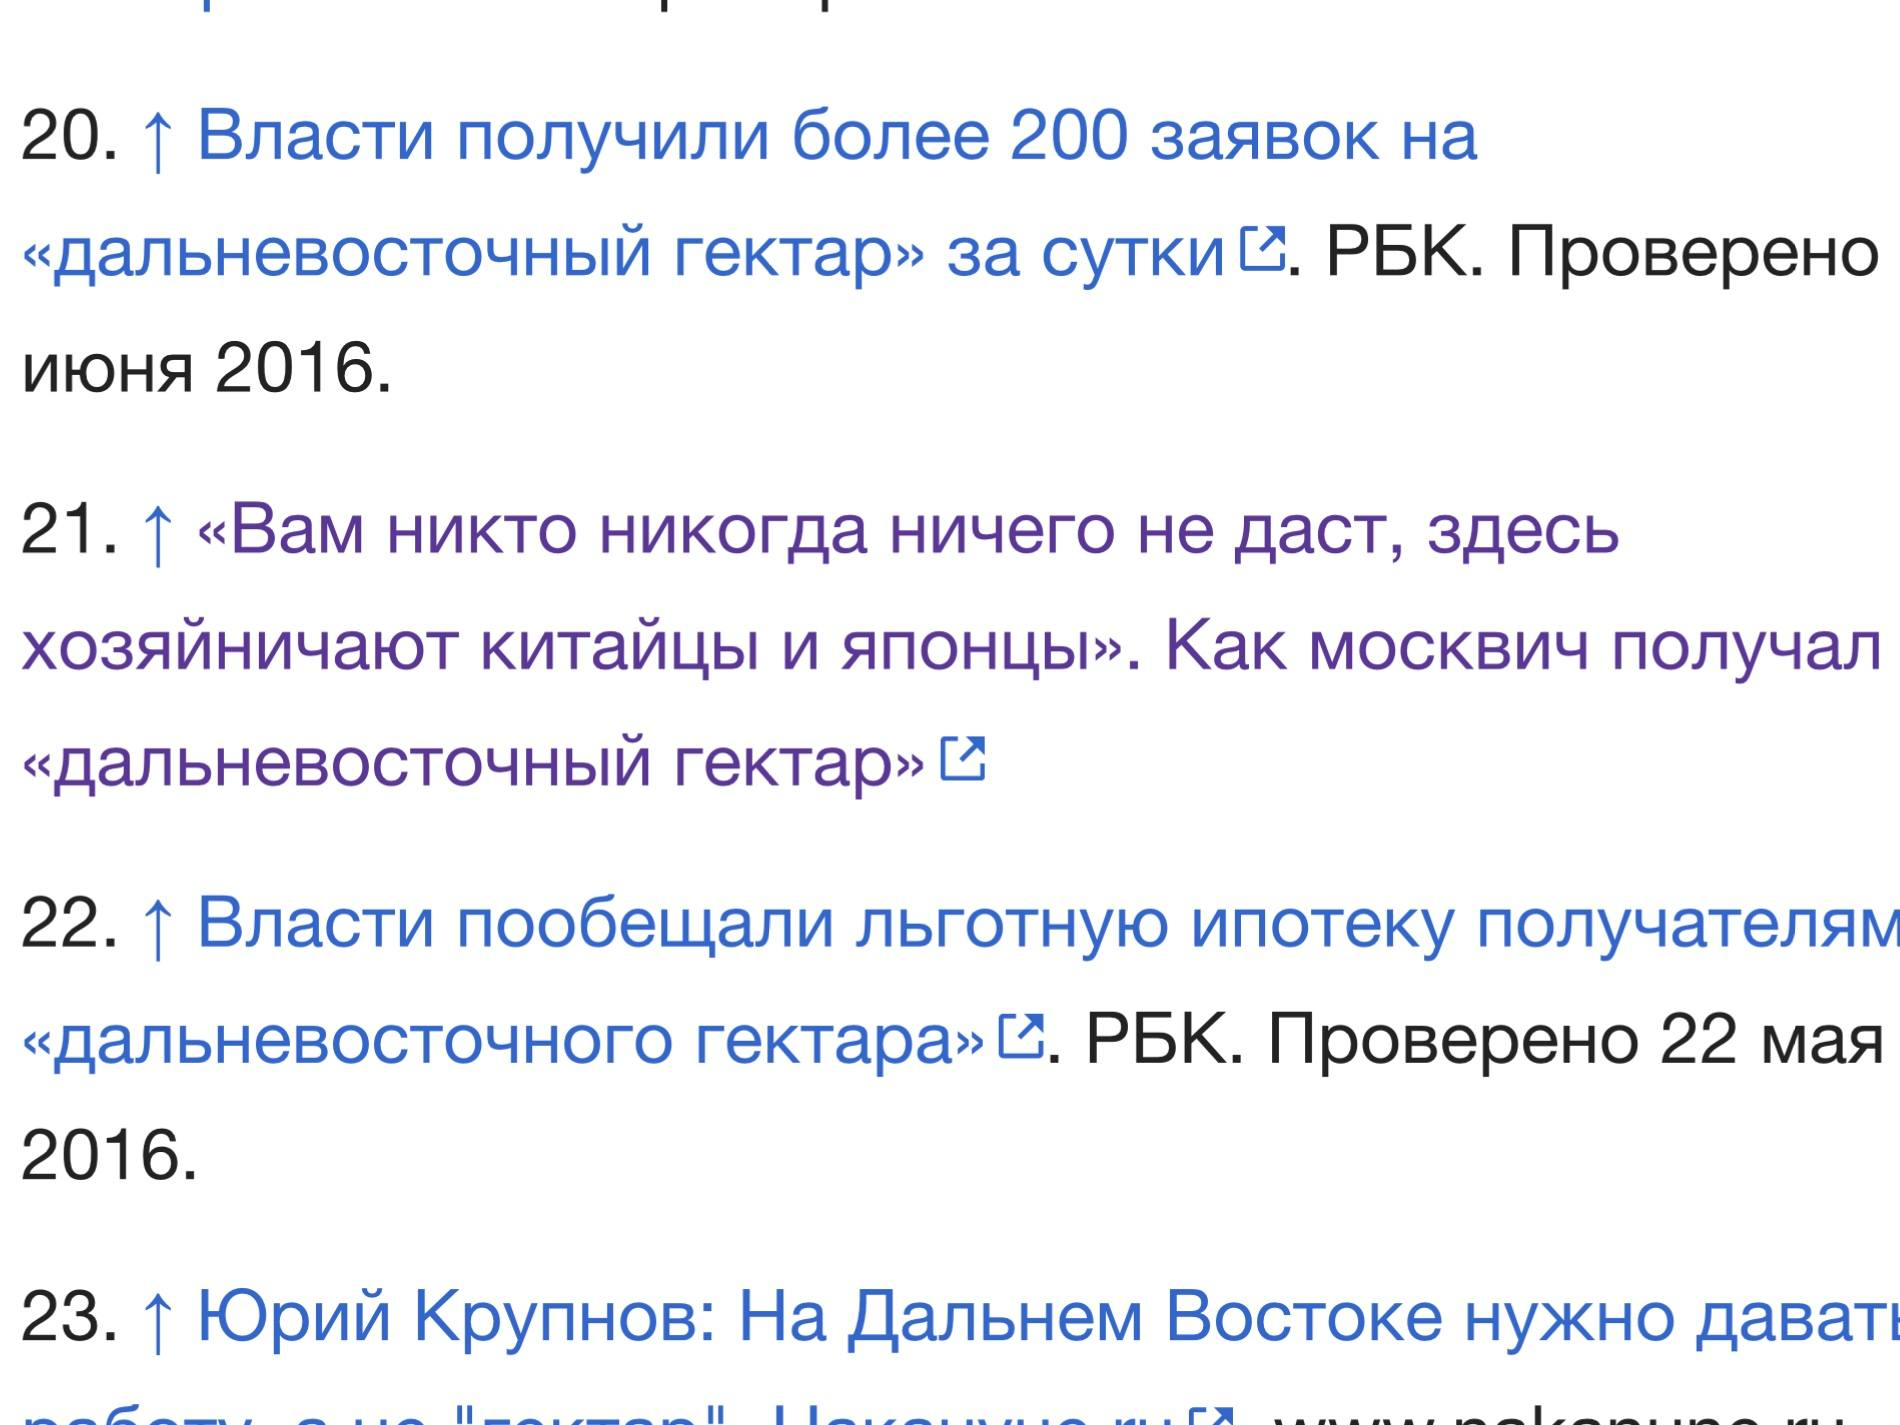 http://images.vfl.ru/ii/1547480370/c3489f0a/24949763.jpg